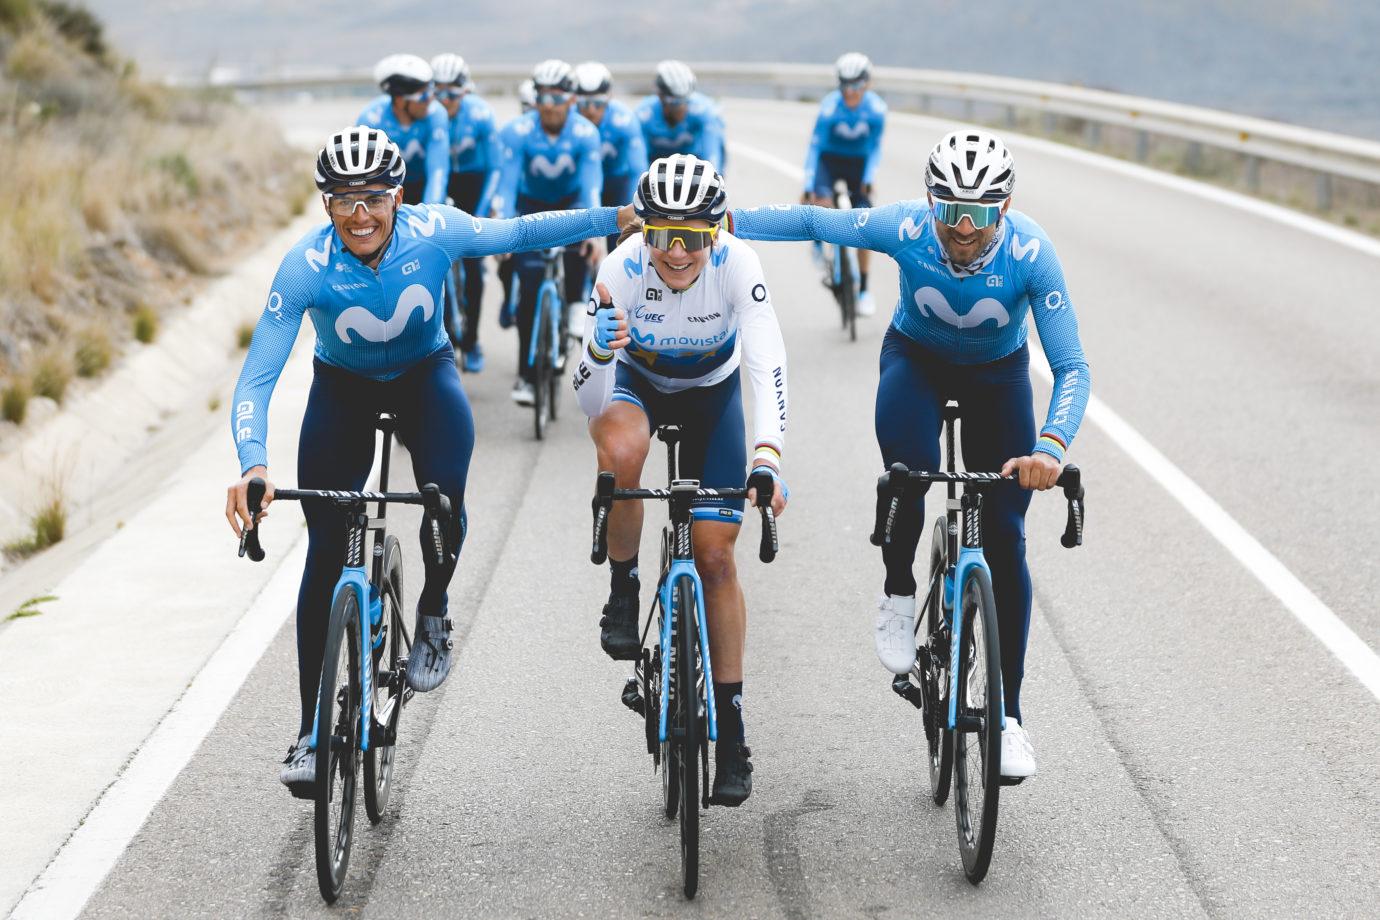 Imagen de la noticia 'Movistar Team aiming for new heights in 2021'